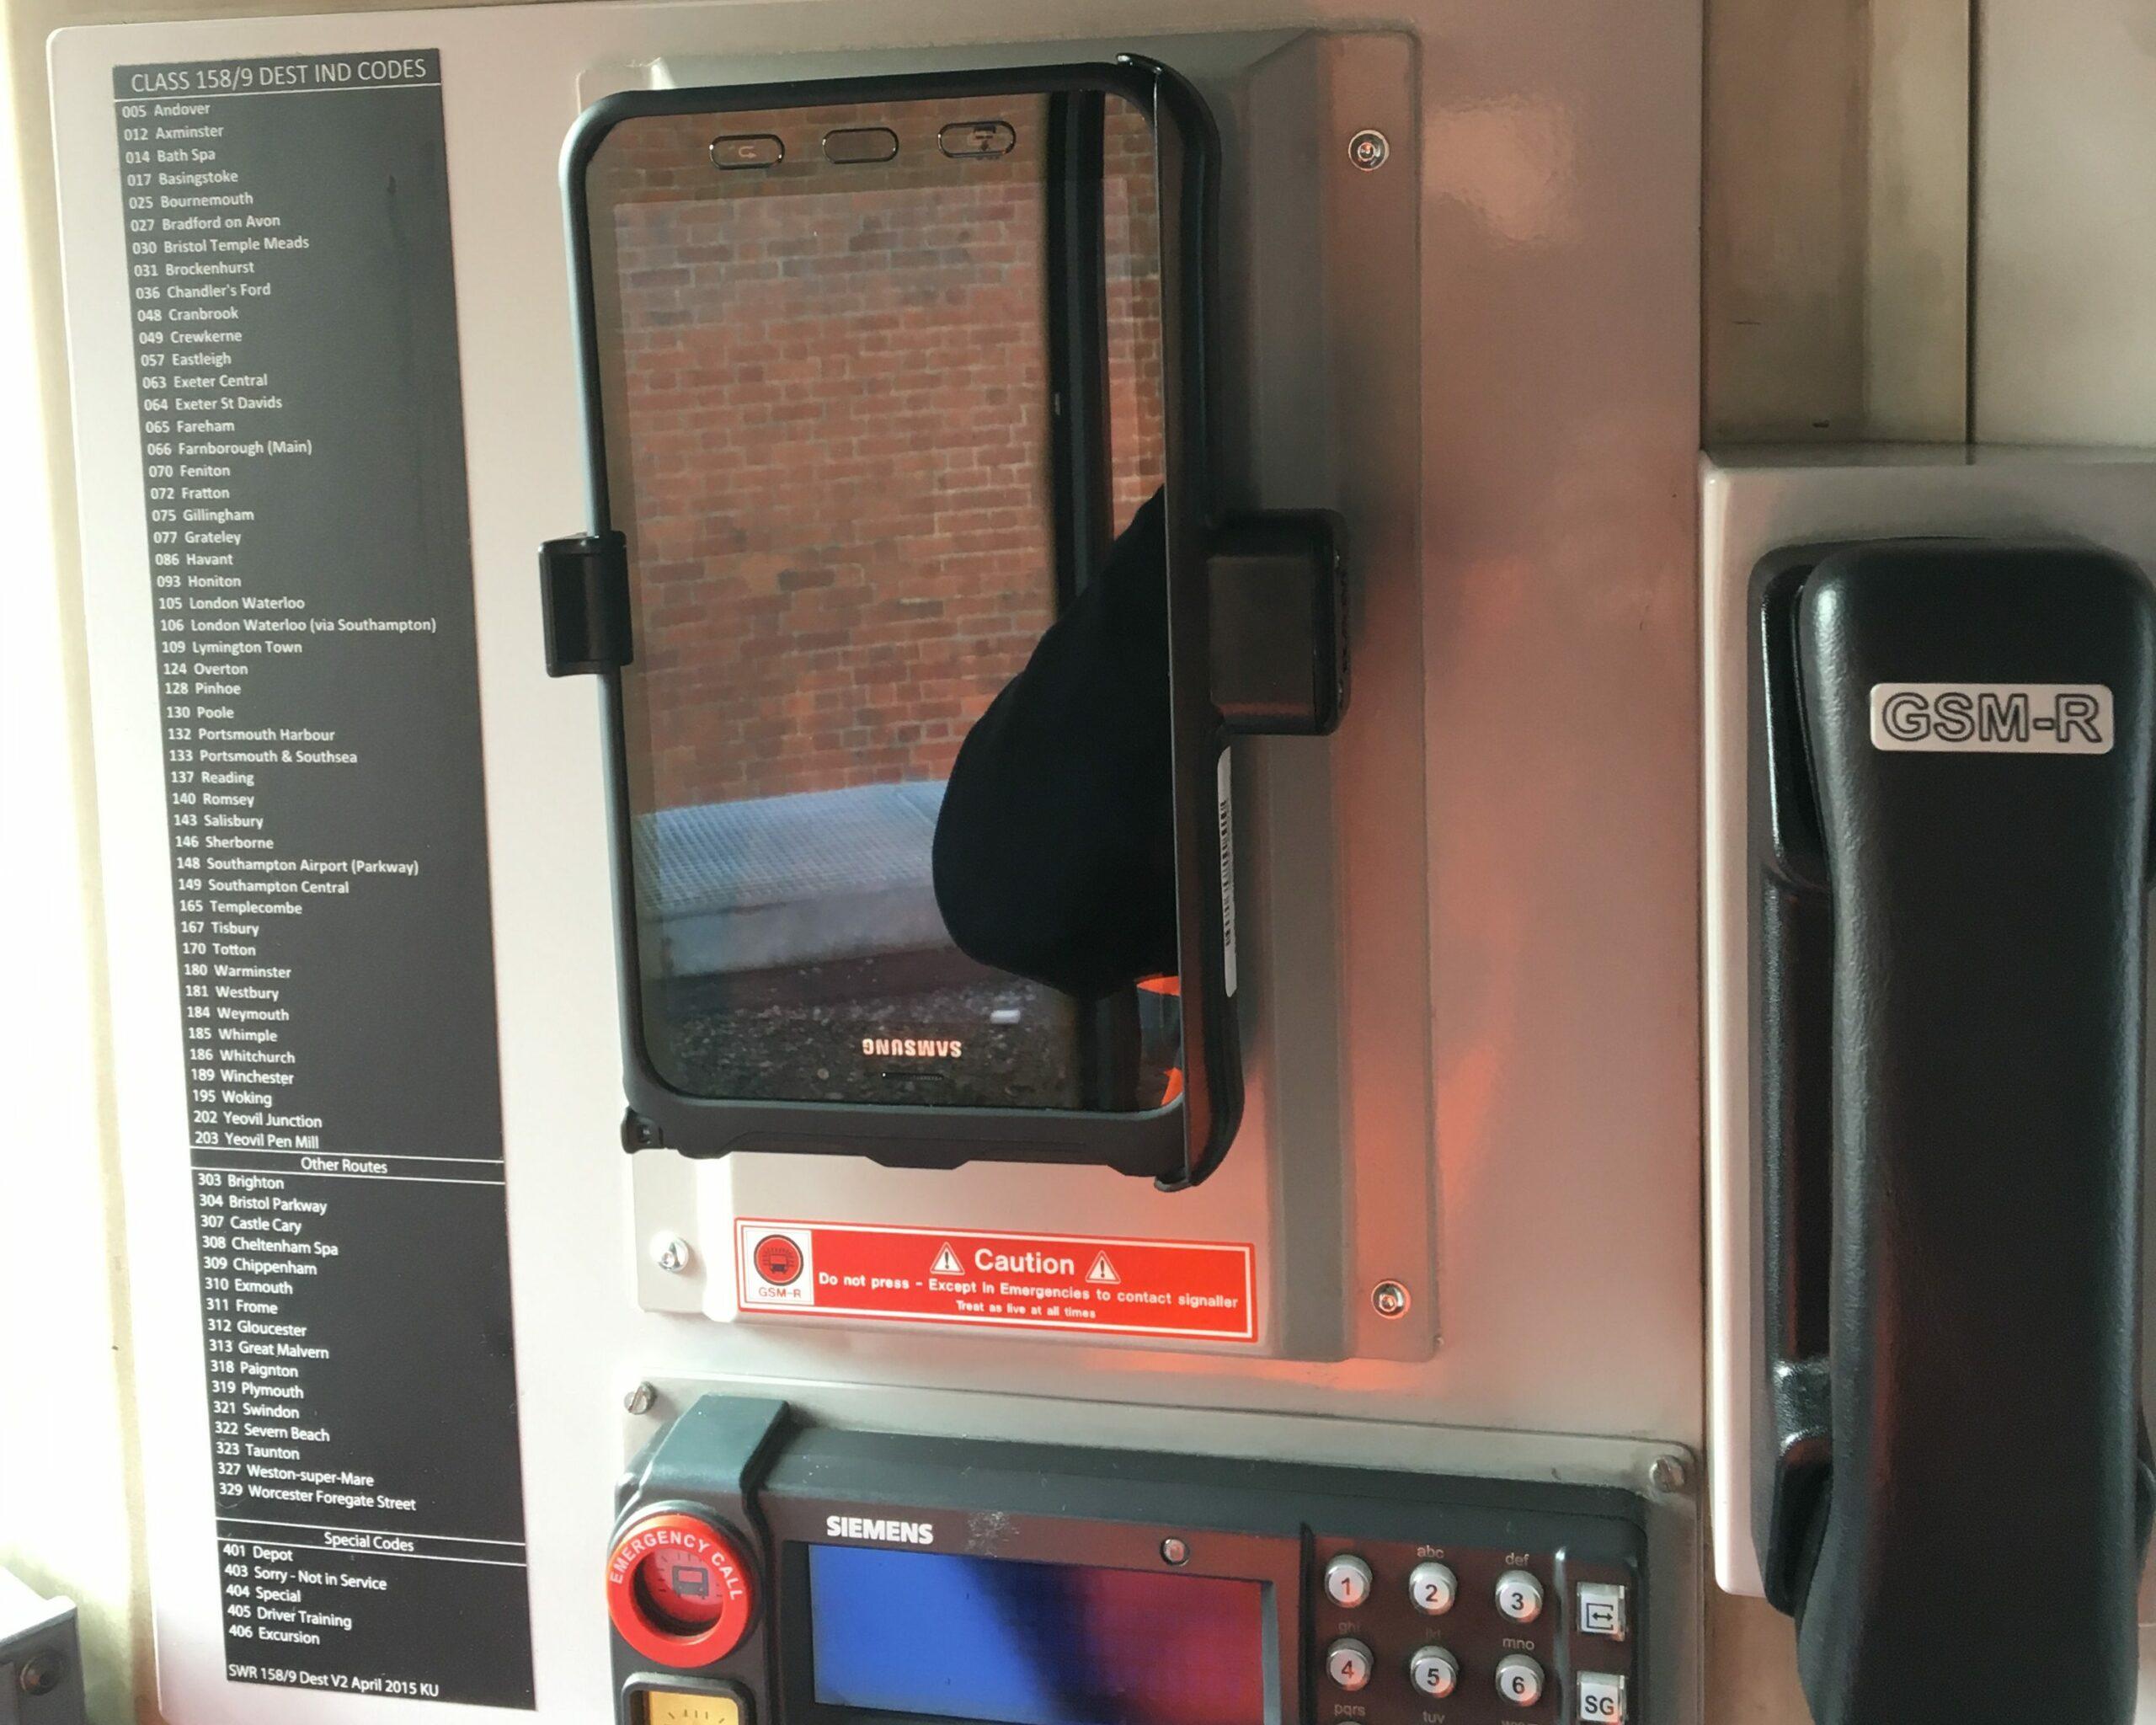 DAS tablet in Class 158